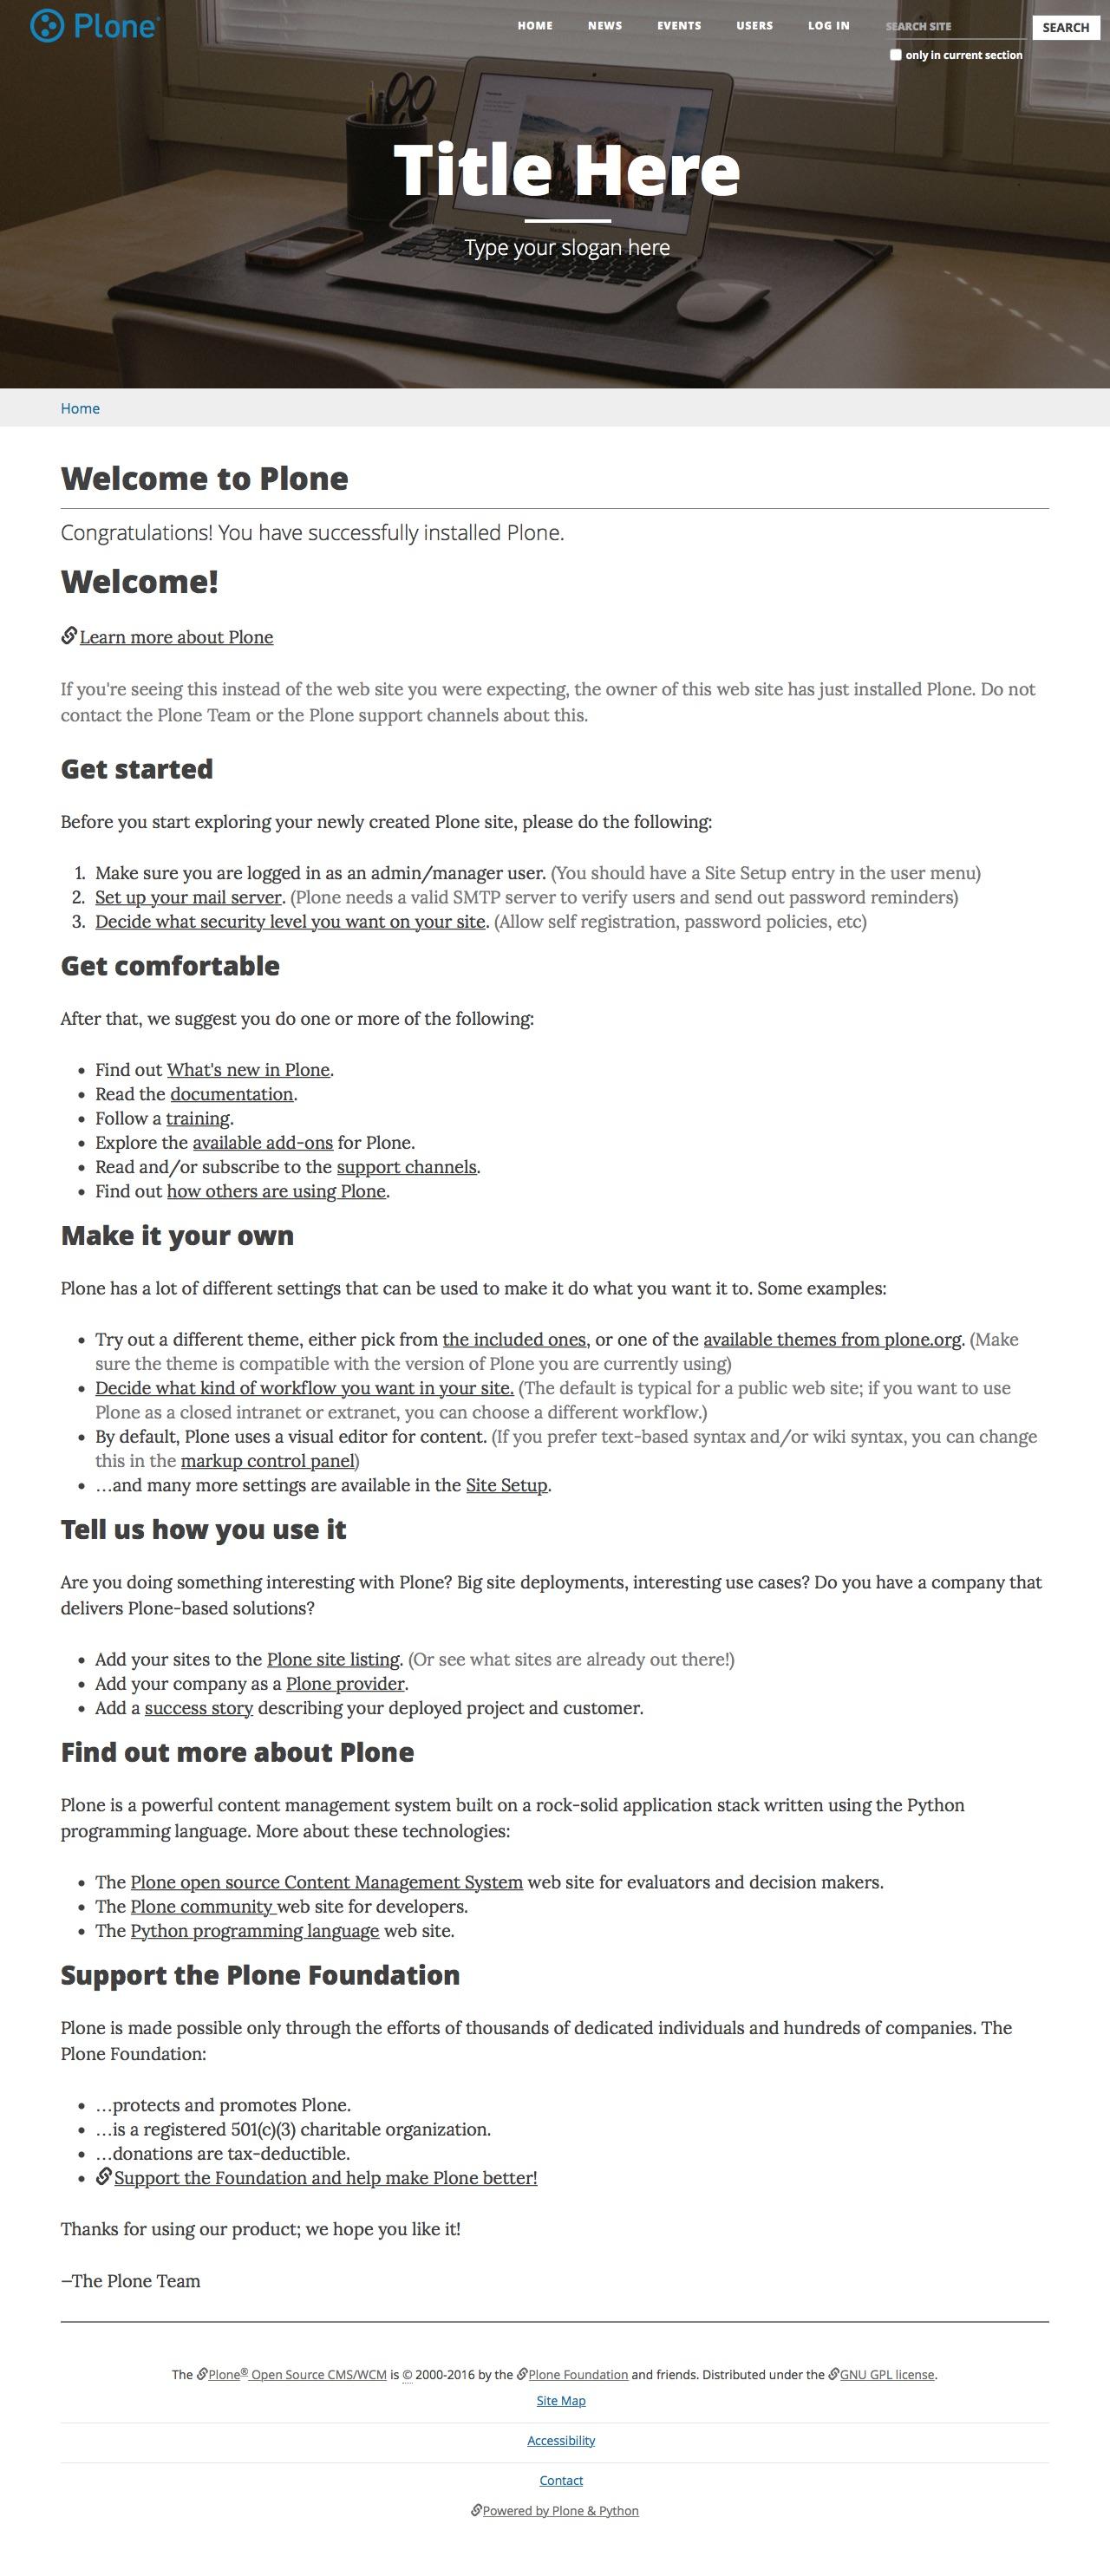 https://raw.githubusercontent.com/collective/plonetheme.clean_blog/master/docs/plonetheme.clean_blog-screenshot.jpg